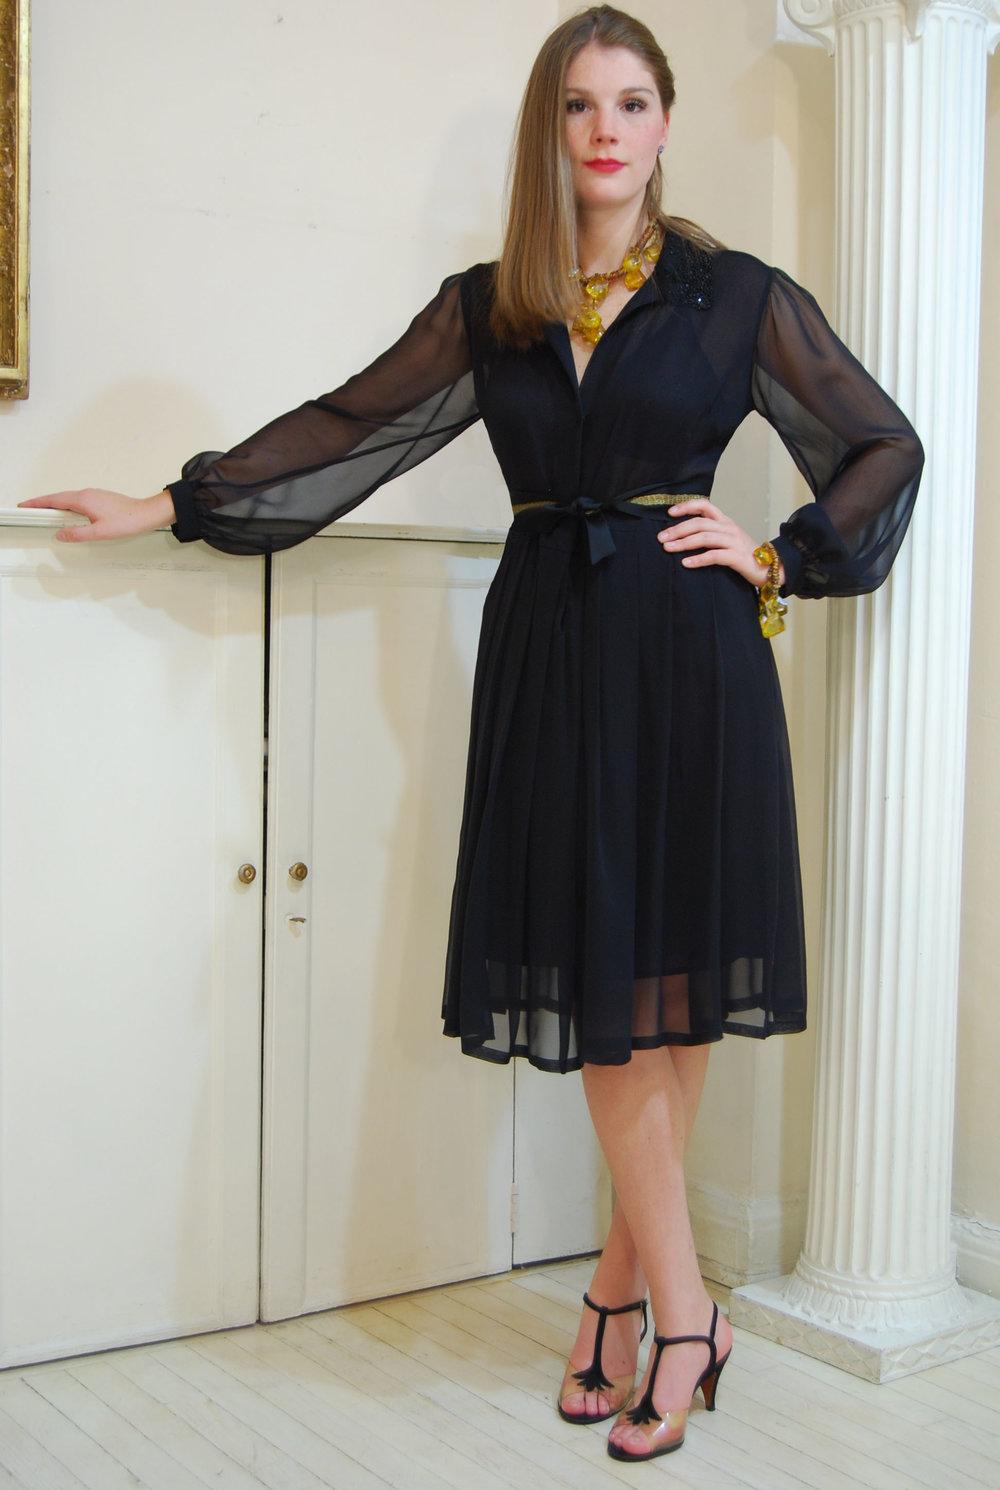 Silk Chiffon shirt dress with snap closure - sold